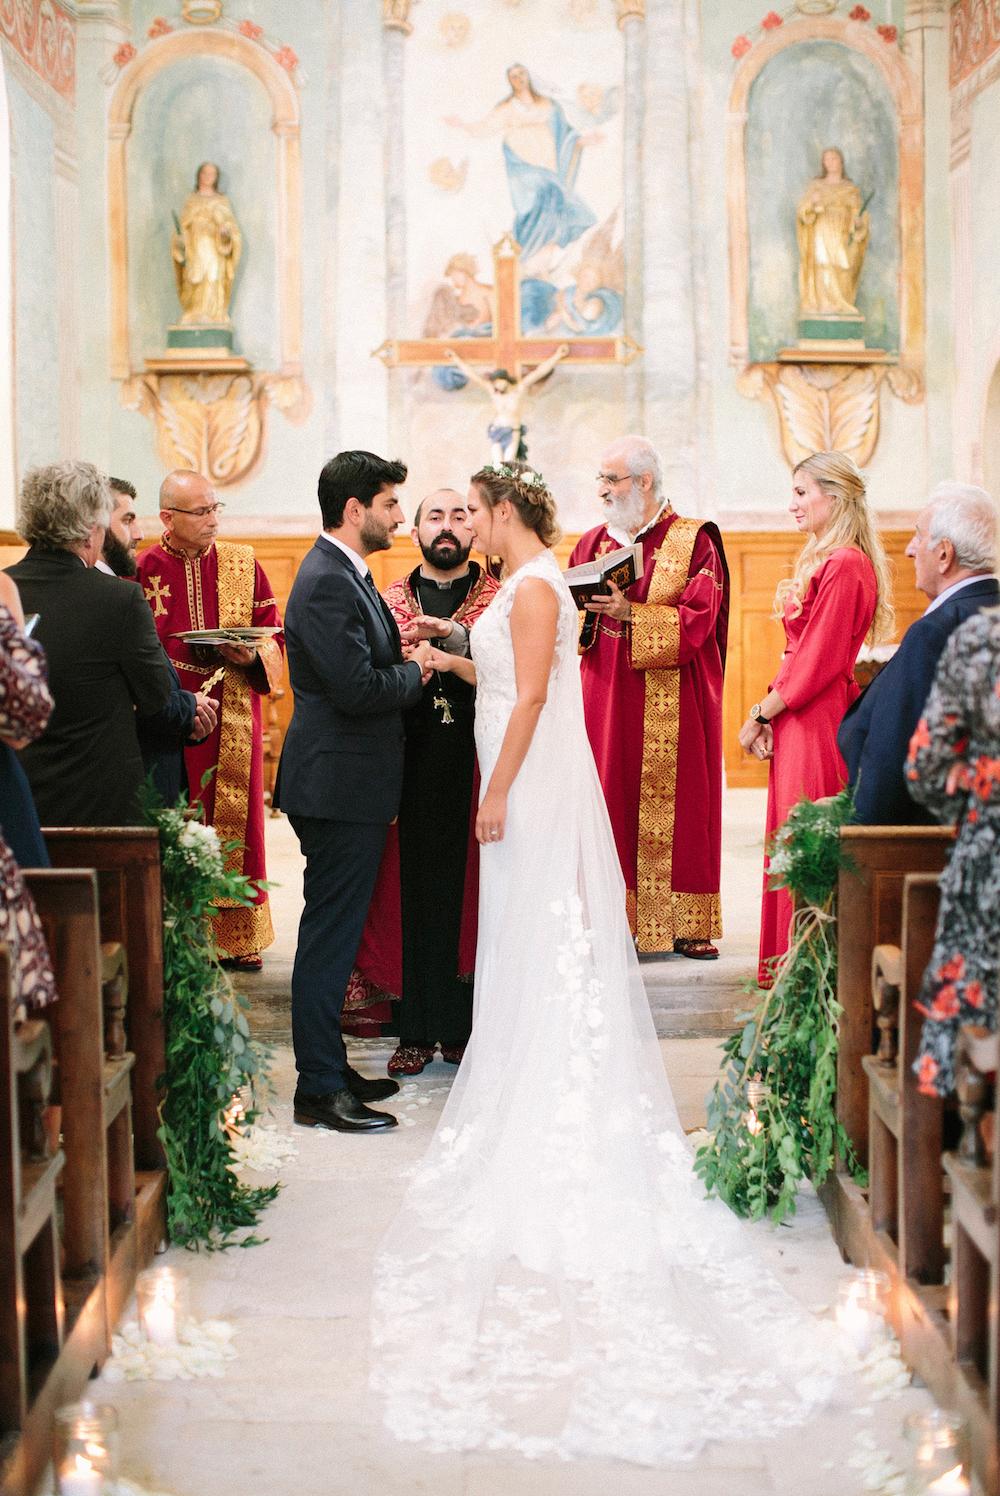 ©-saya-photography-studio-ohlala-wedding-photographer-photographe-mariage-chateau-de-la-tour-vaucros-avignon-139.jpg